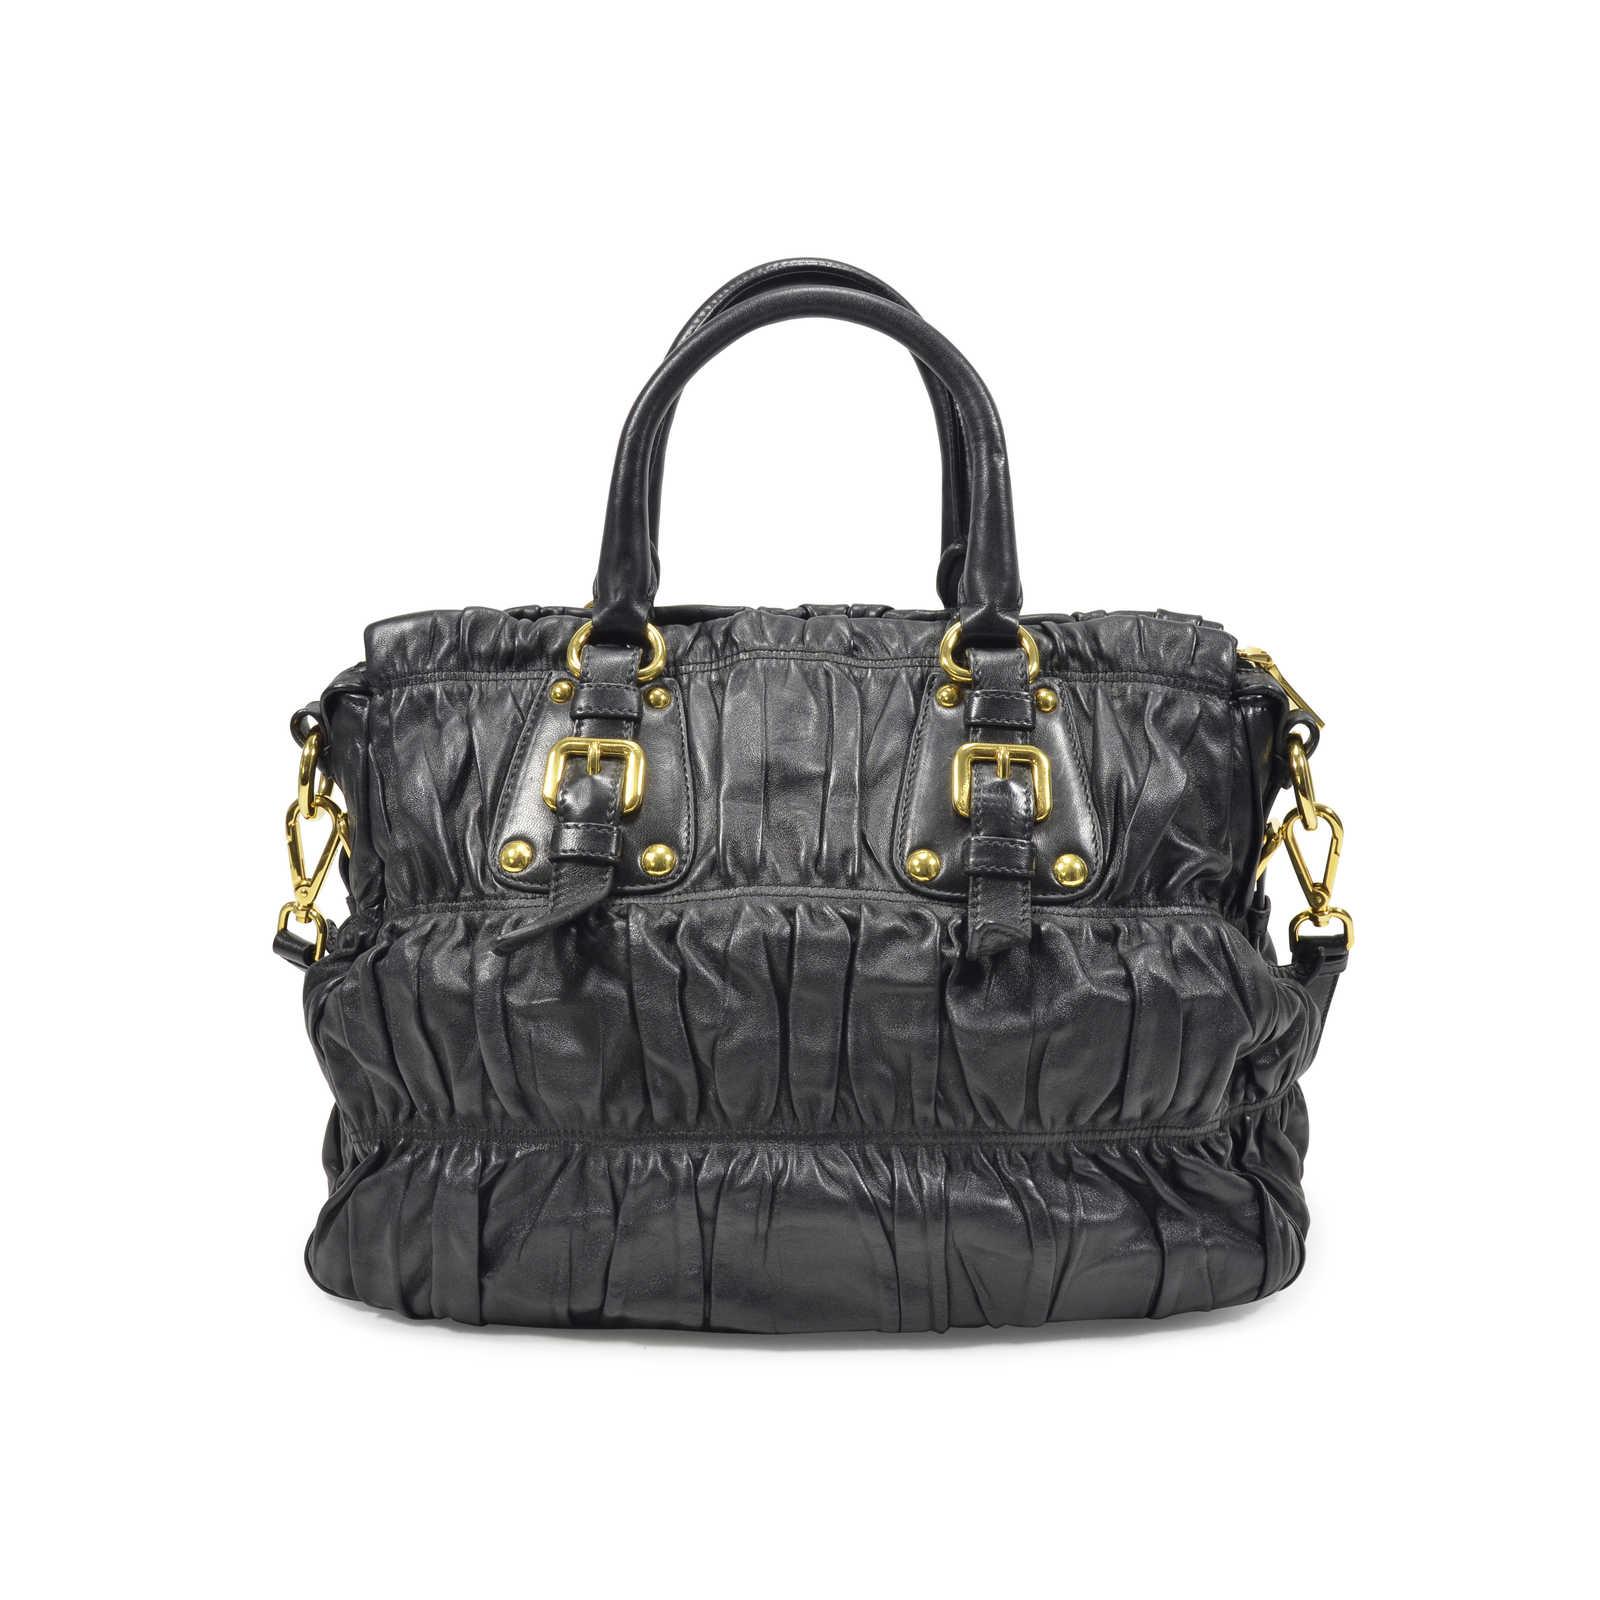 Prada Nappa Gaufre Bag Black - Thumbnail 1